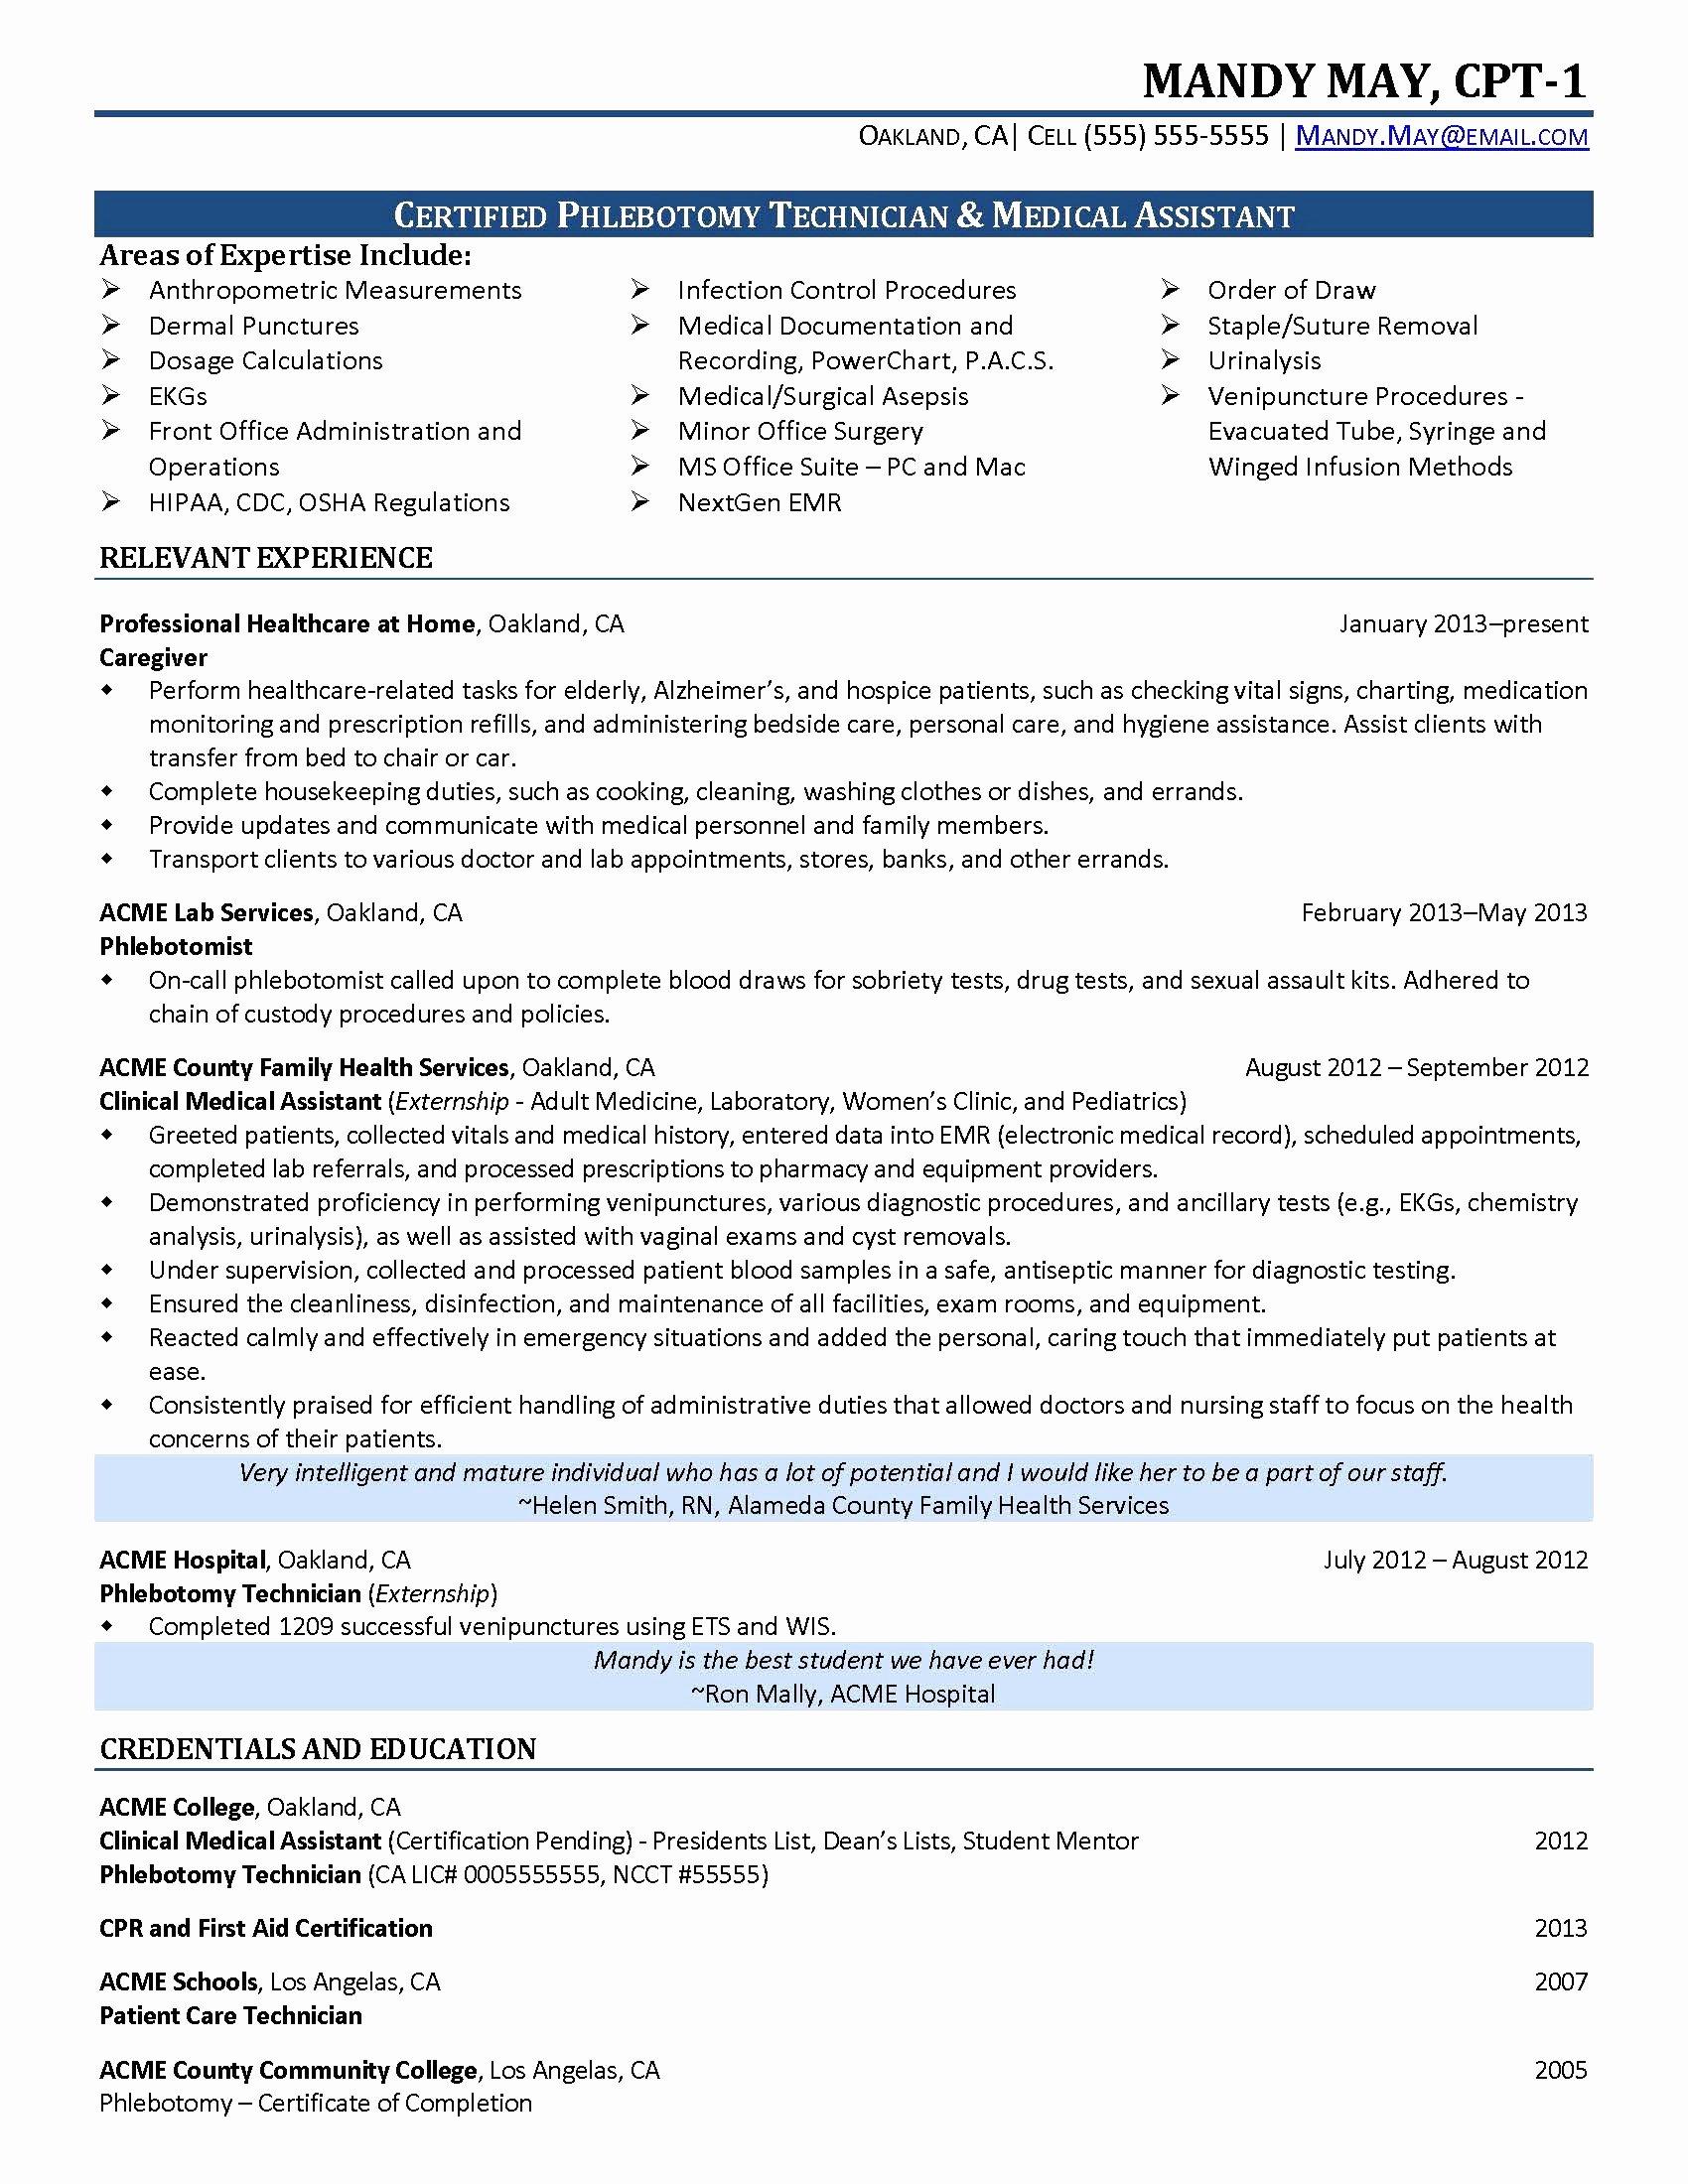 Resume Samples for Medical assistant Student